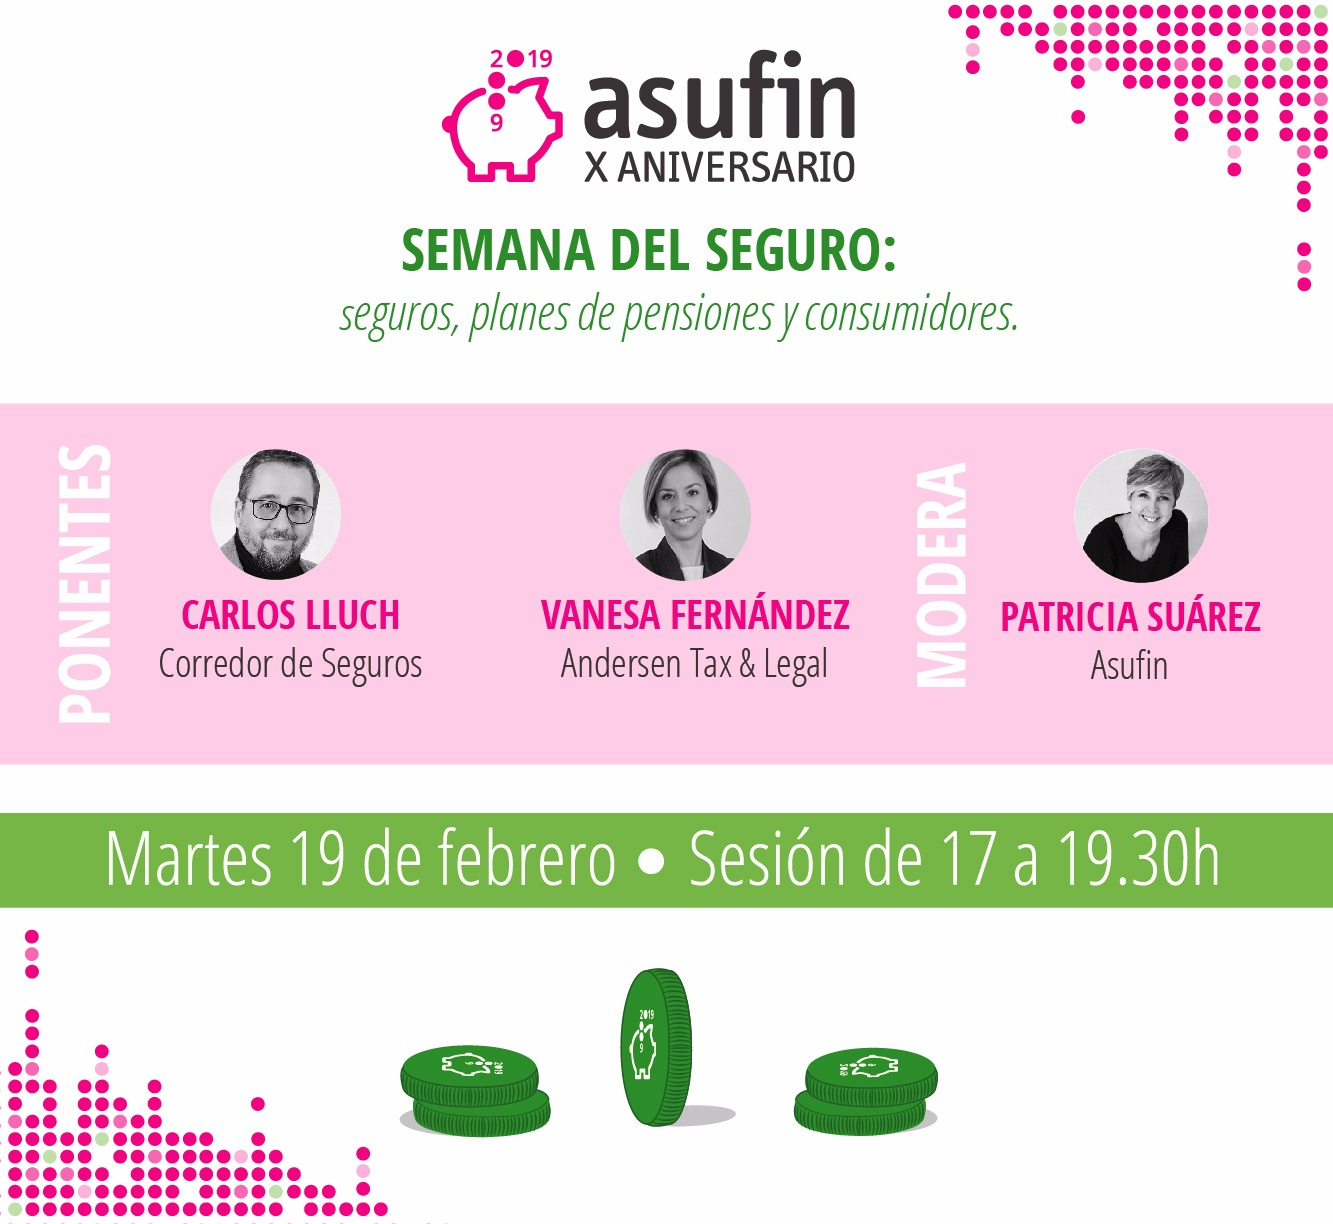 190219_ASUFIN_SEGUROS_MADRID